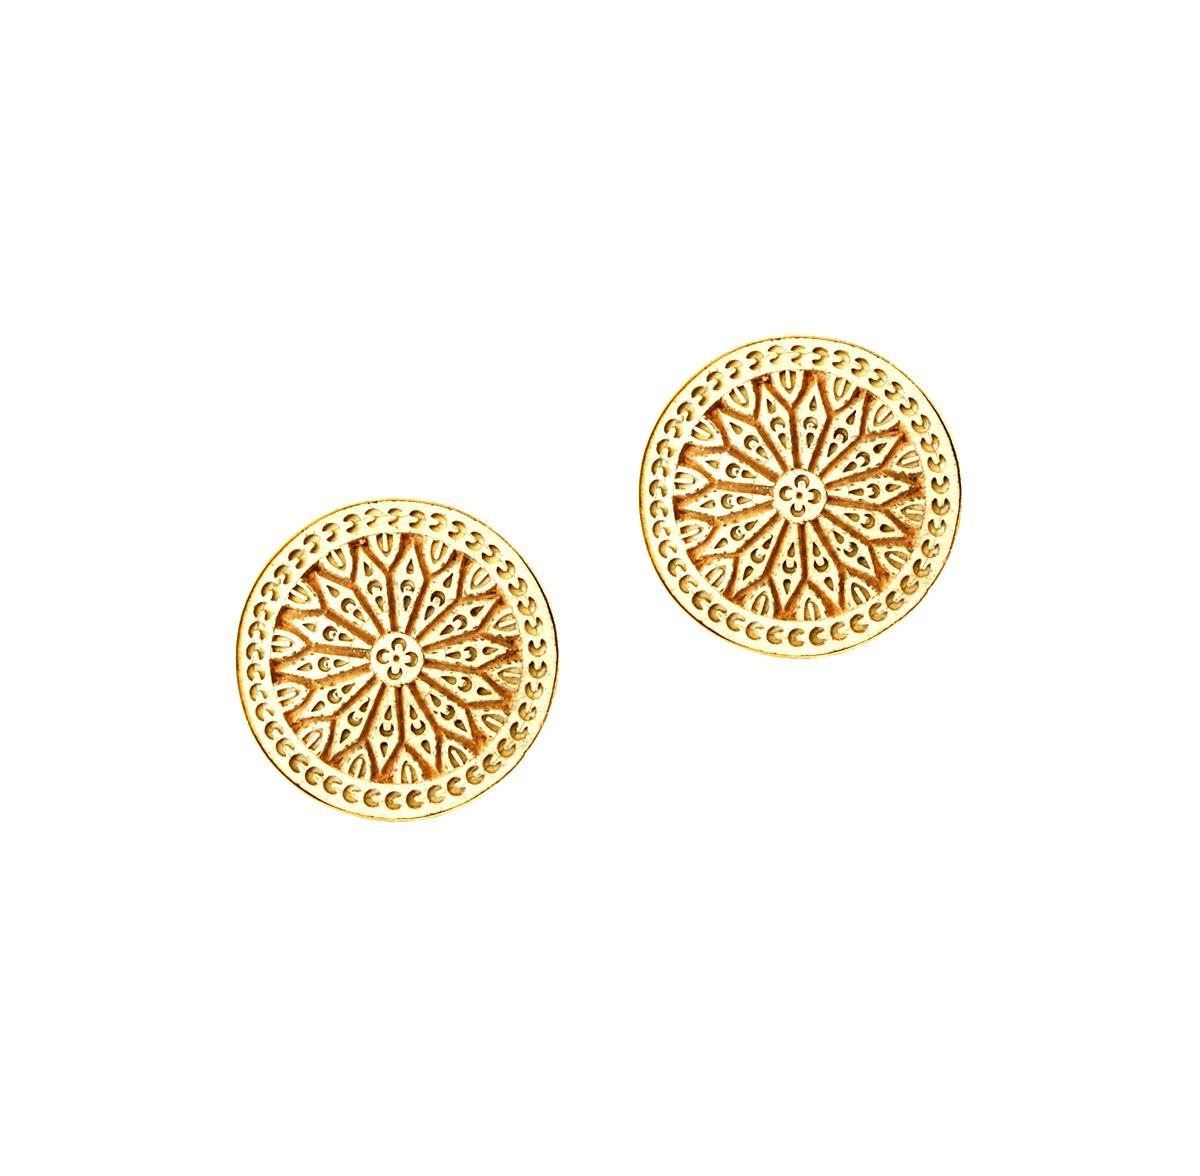 Nomad earrings